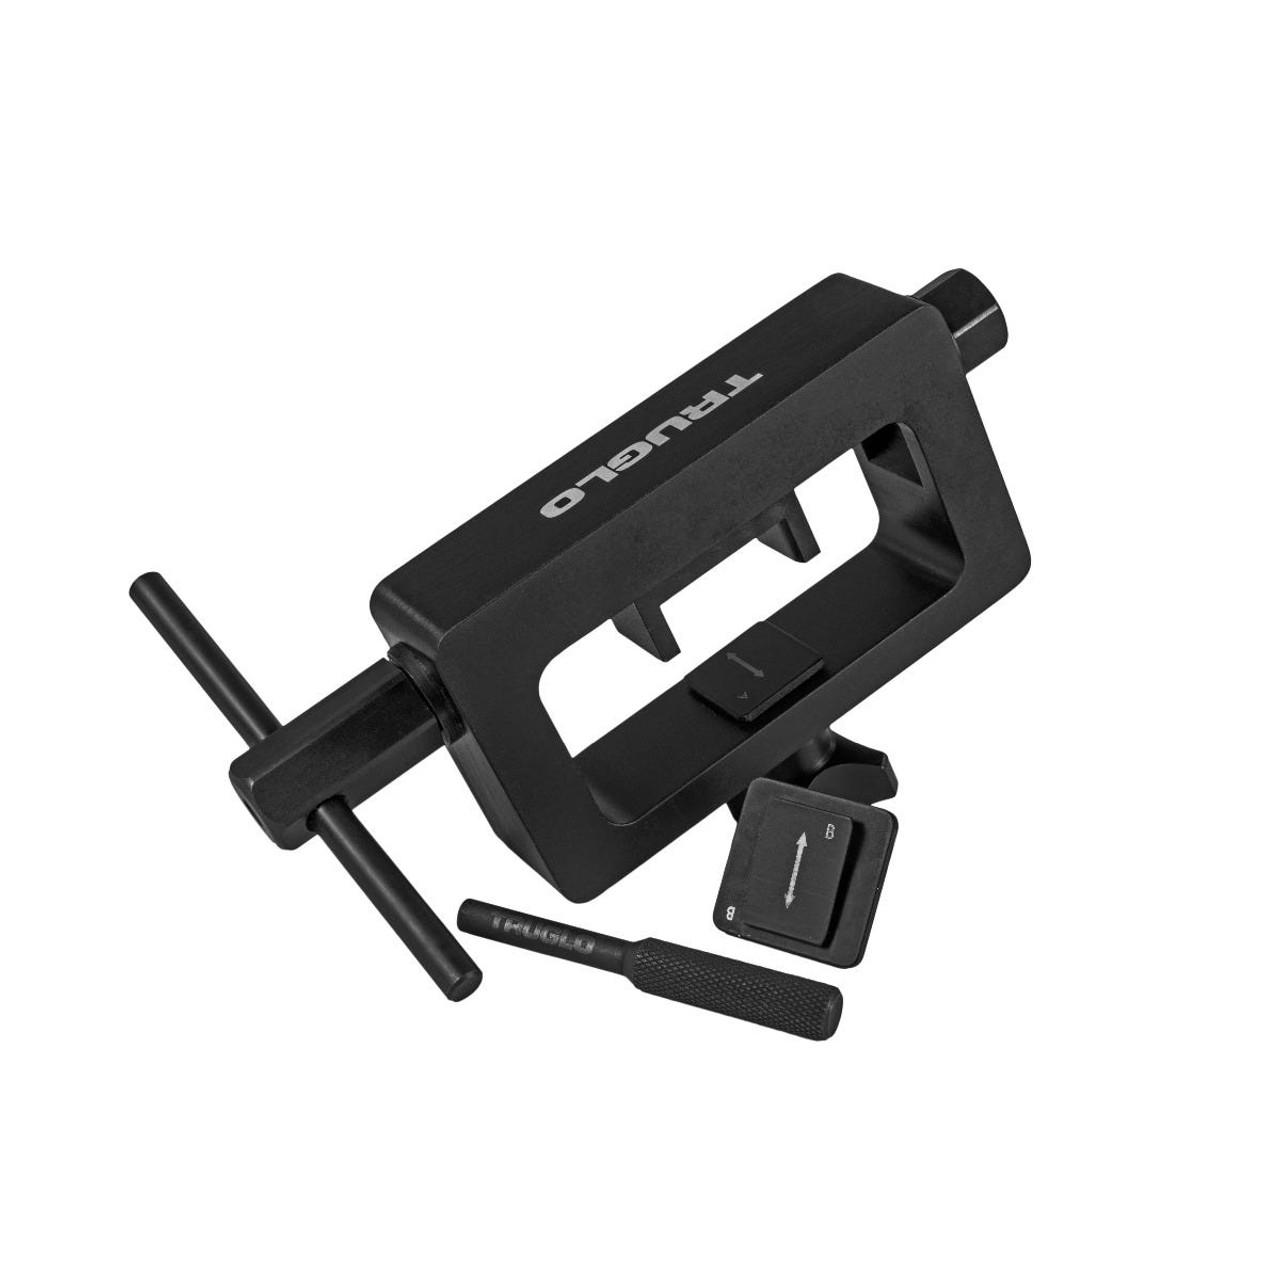 Sight Installation Tool Set for Glock